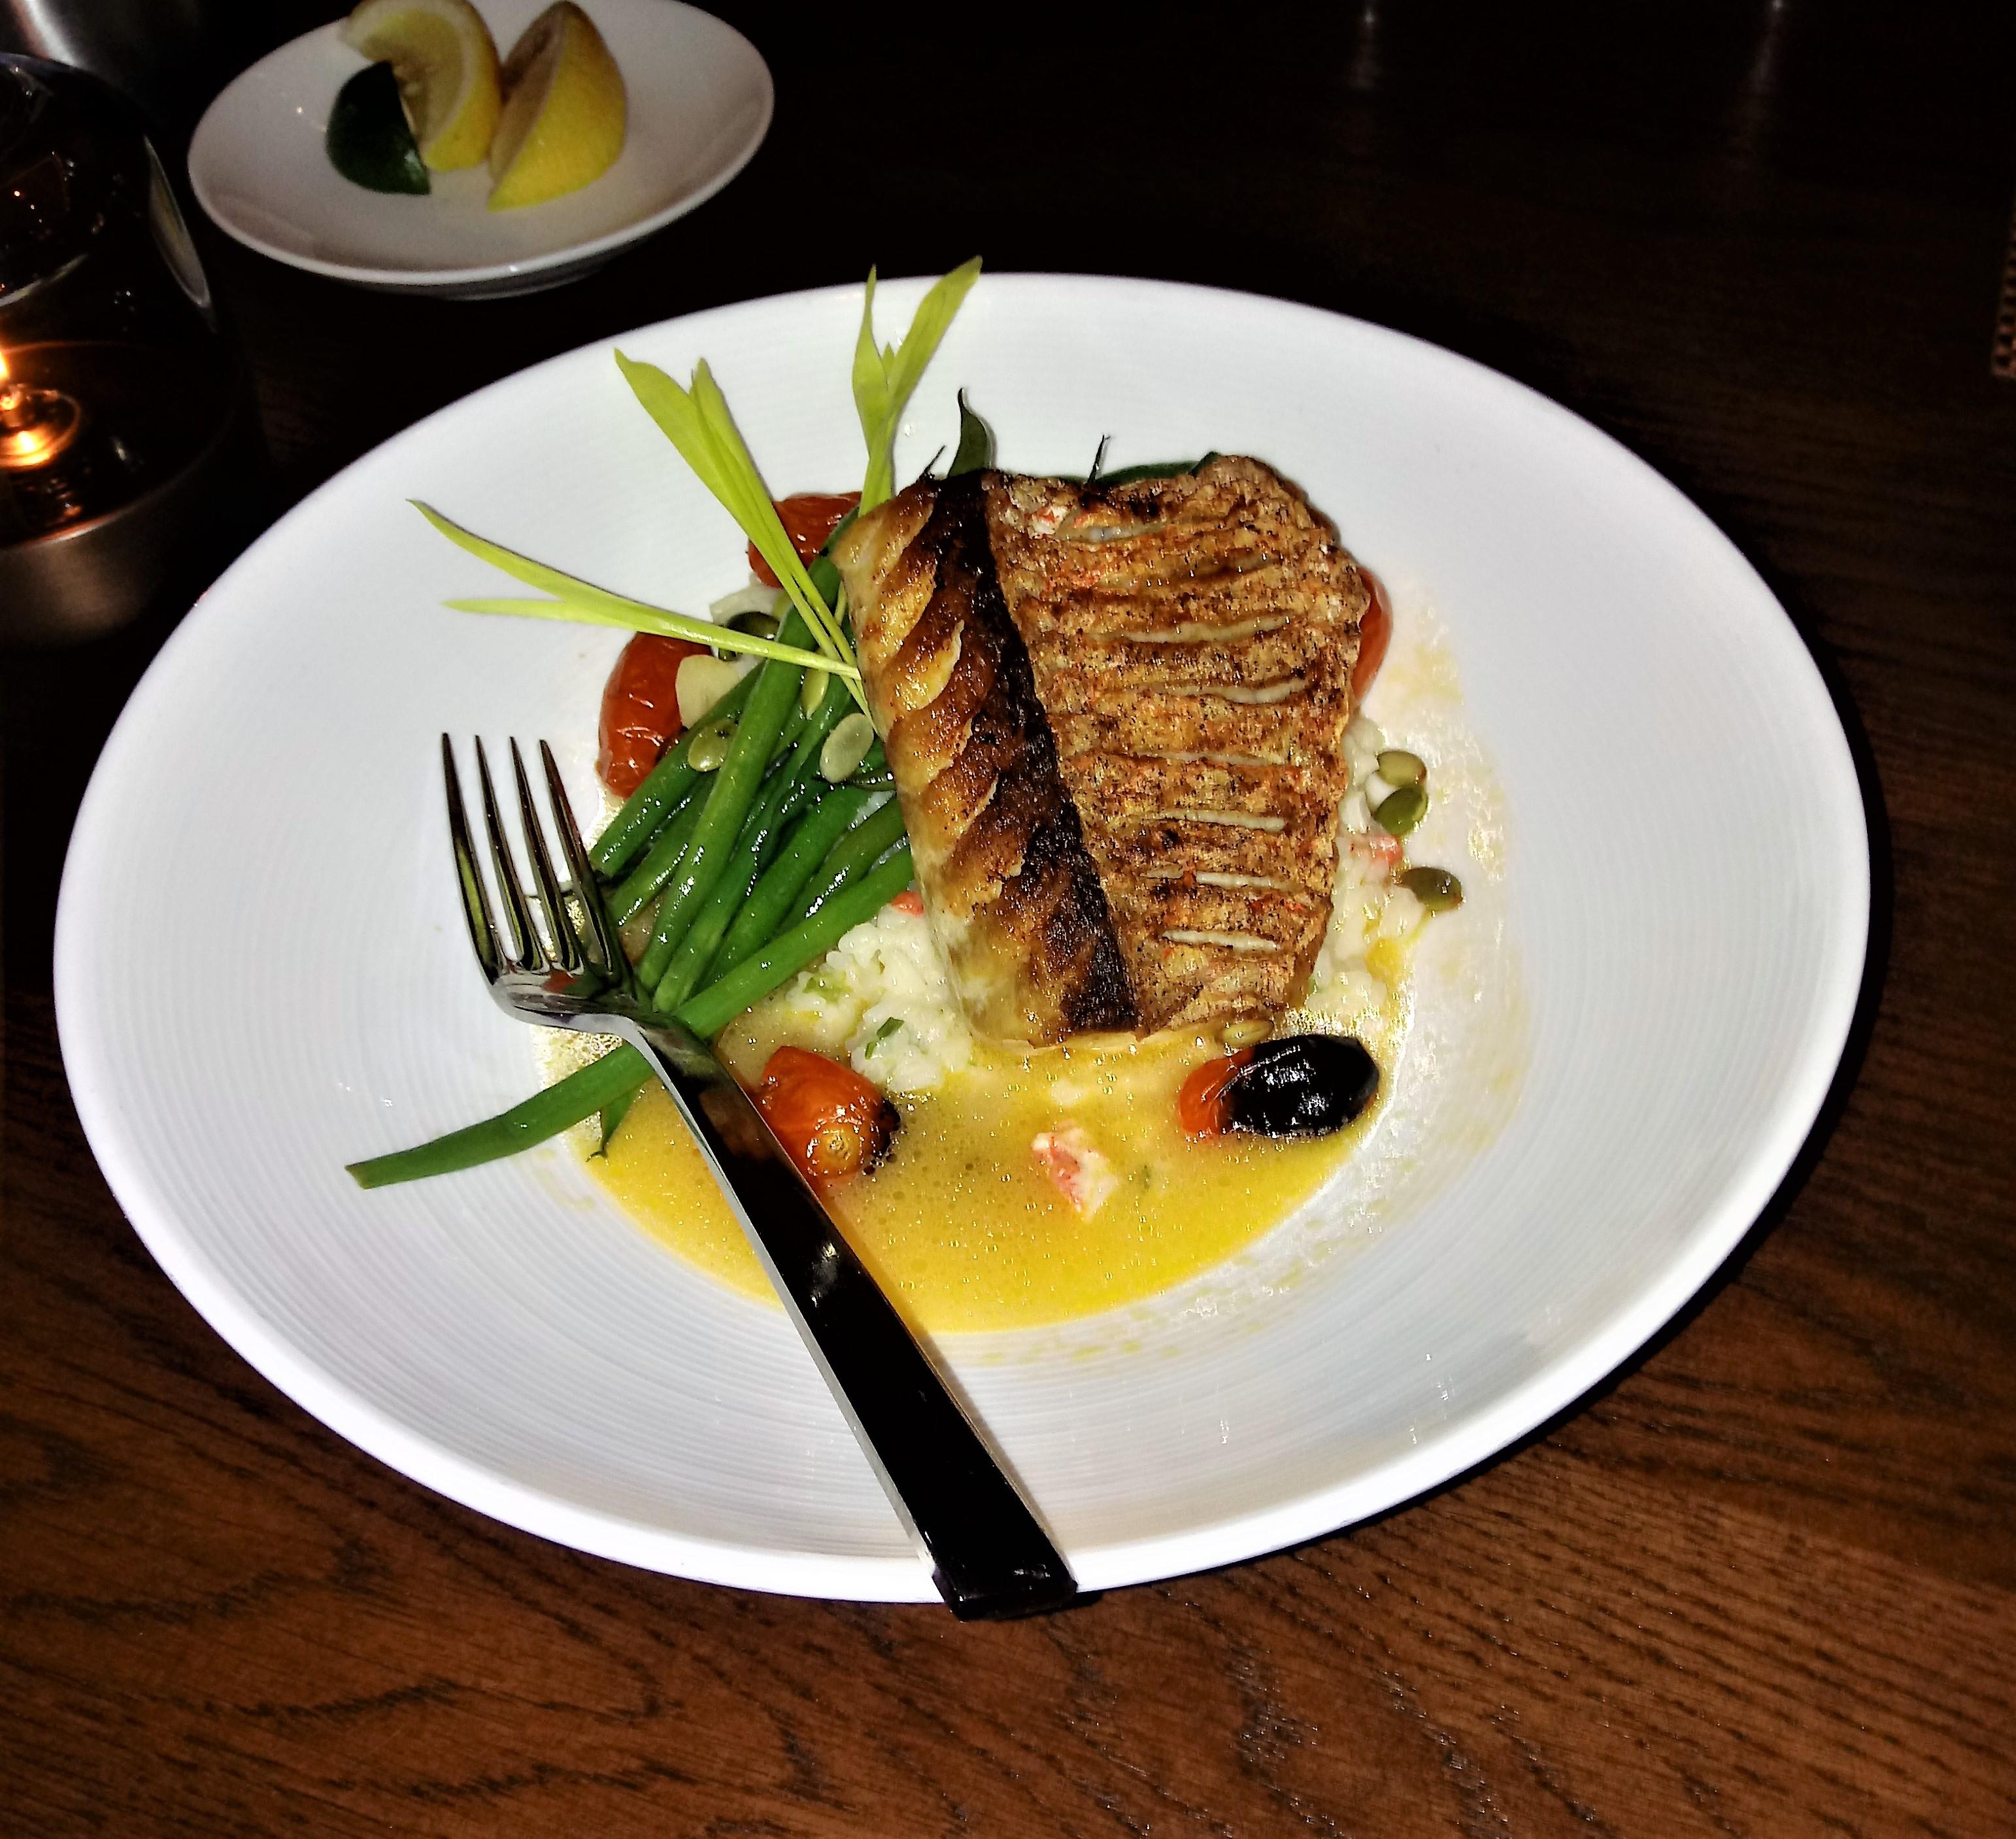 CRAVEABLE CAROLINAS – Much at Steak